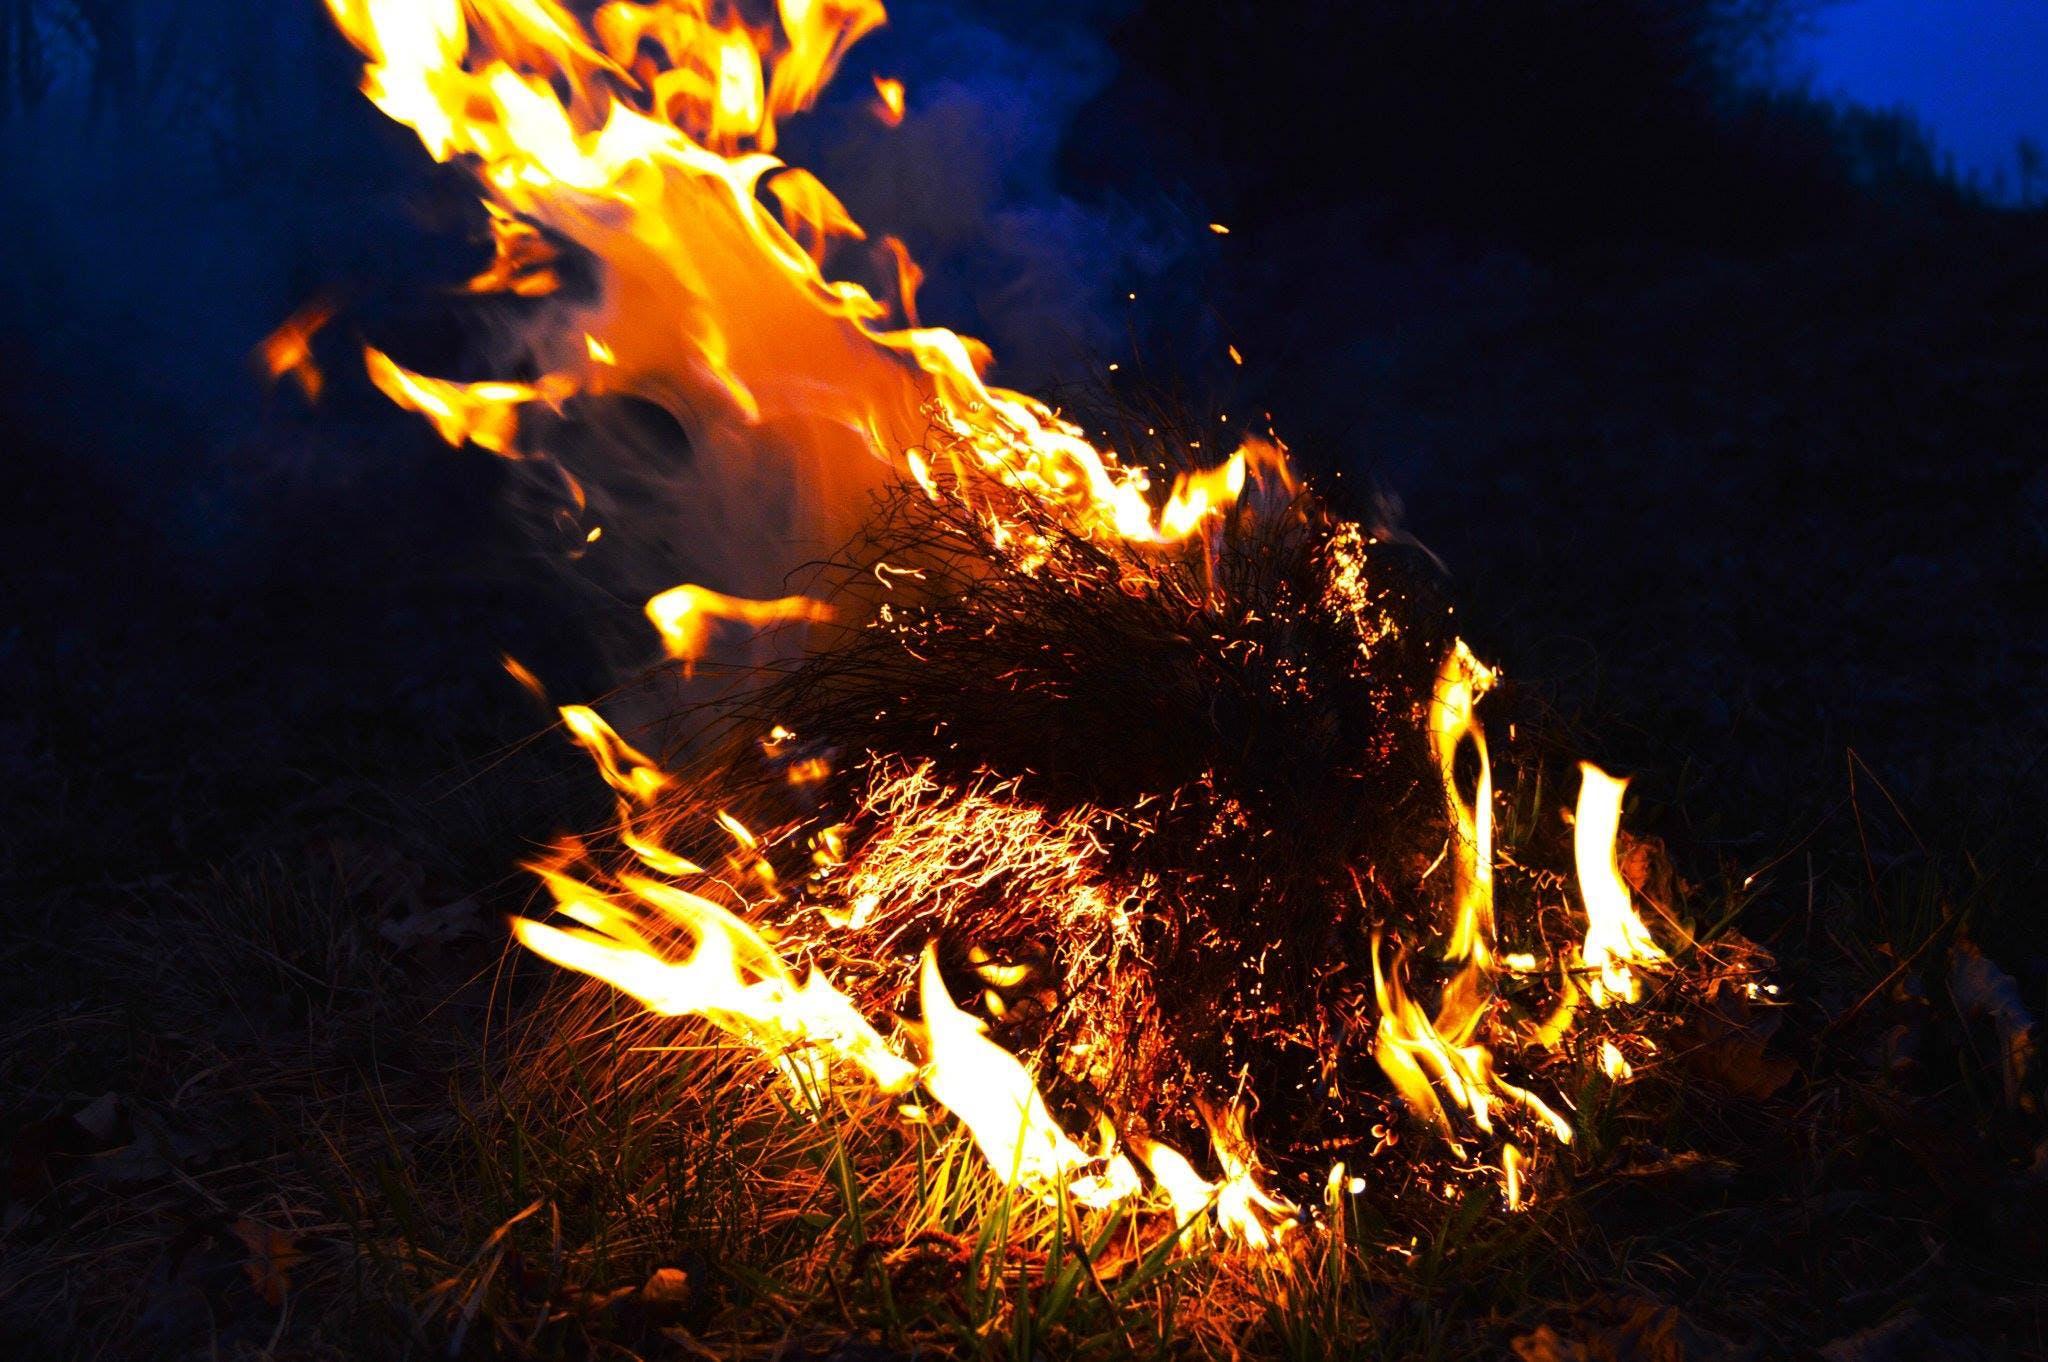 Free stock photo of bonfire, fire, flame